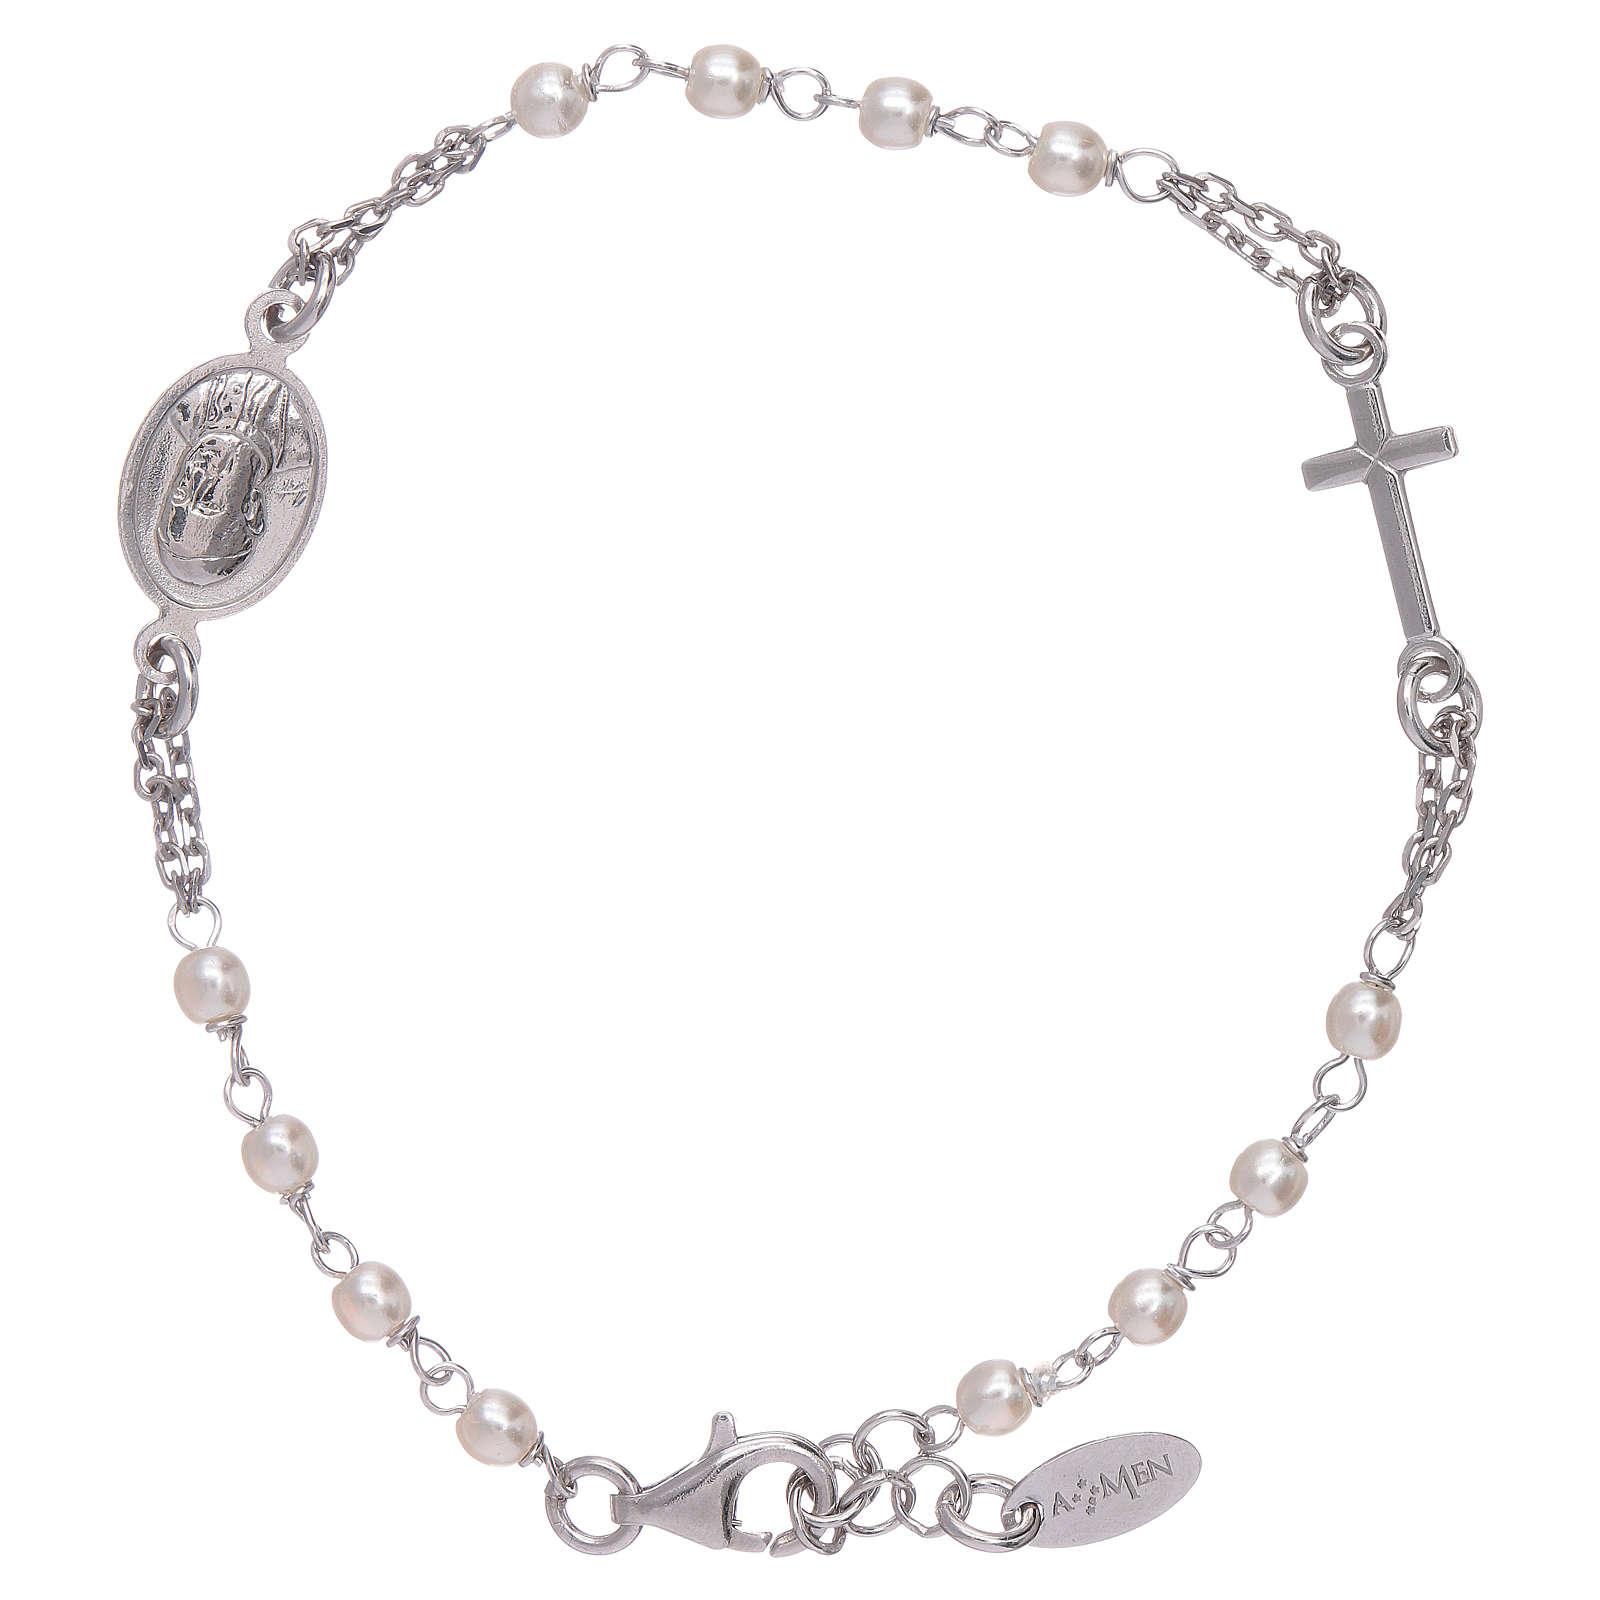 Bracelet AMEN Jubilé perles Swarovski et argent 925 4